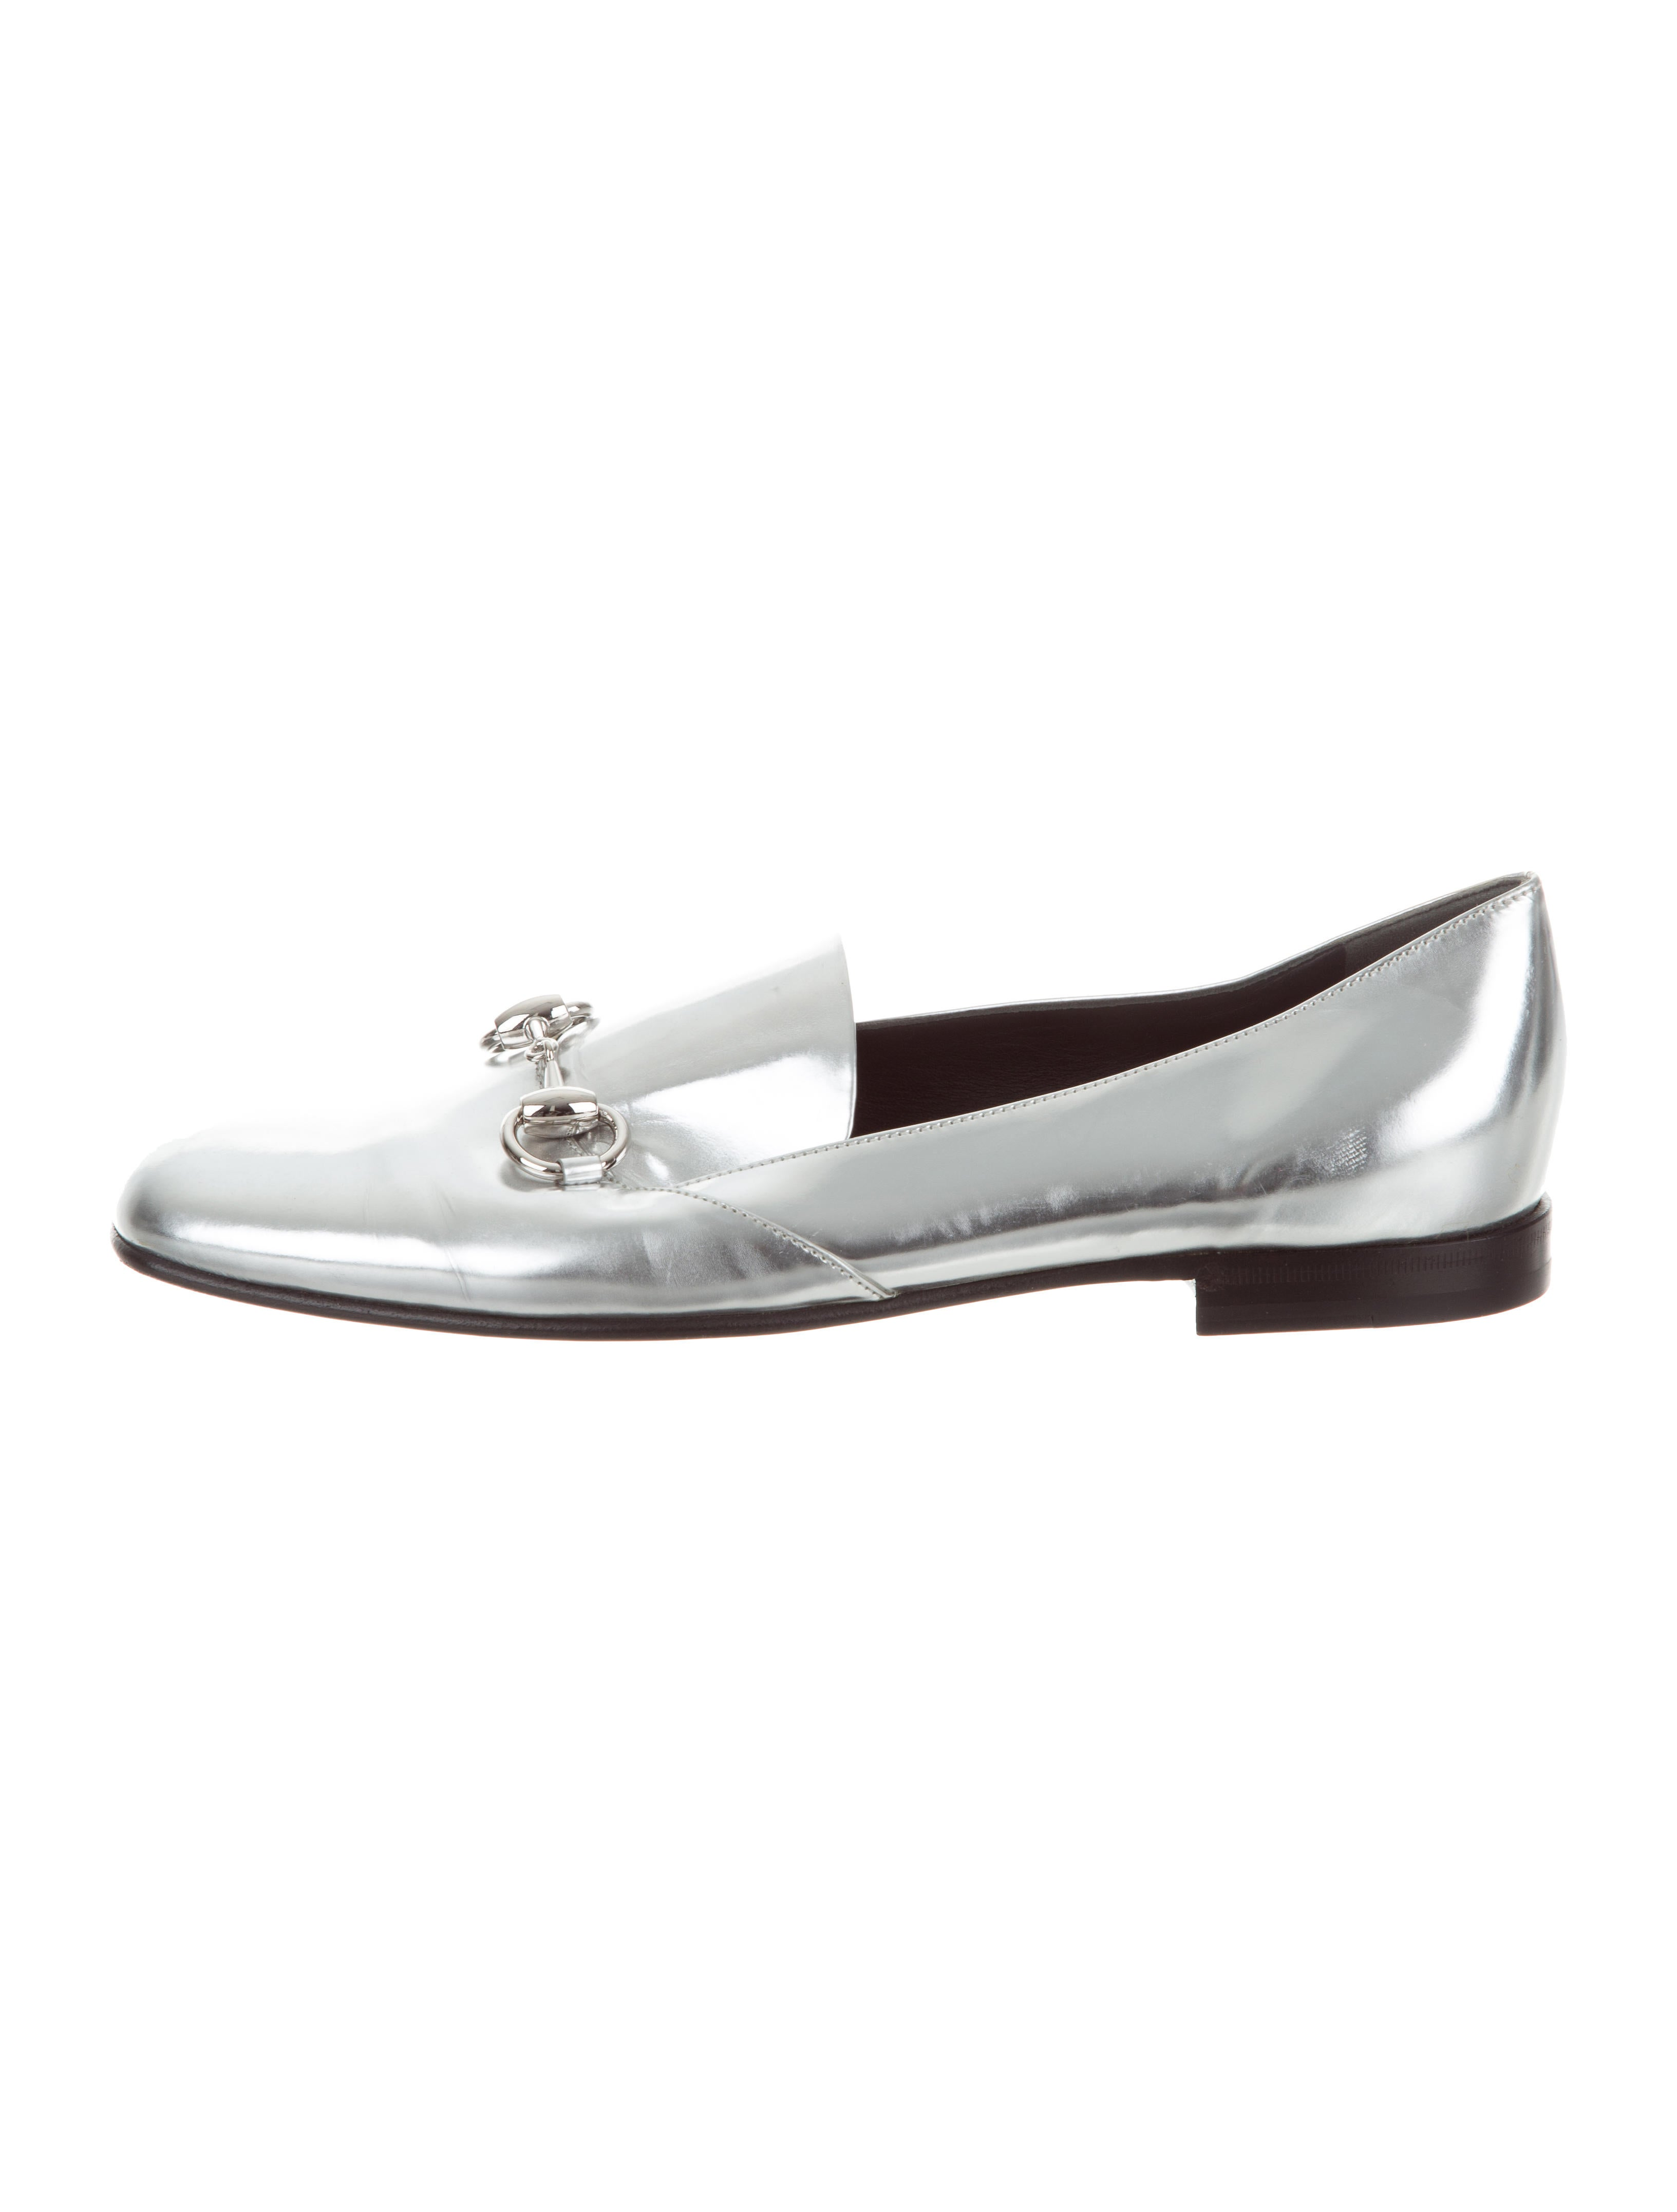 b44d0d3df2b Gucci Metallic Horsebit Loafers - Shoes - GUC179482